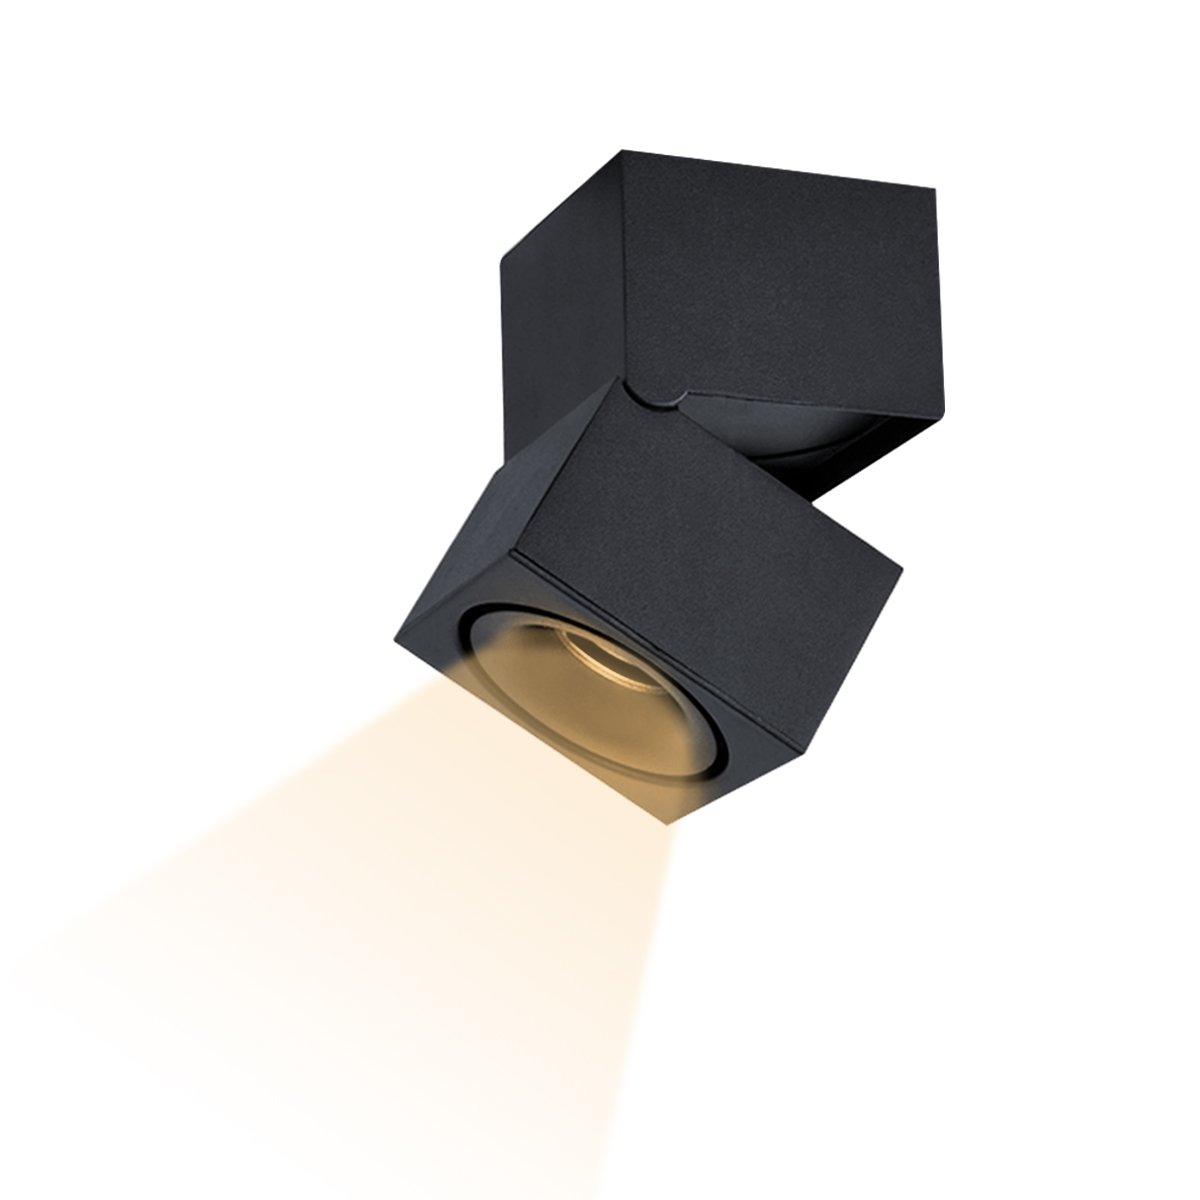 Dslg Indoor 15W LED Spotlight 360°Adjustable Ceiling Downlight/Surface Mounted COB Lighting LED/10X15CM/Aluminum Wall Lamp Or Spot Light (Black)